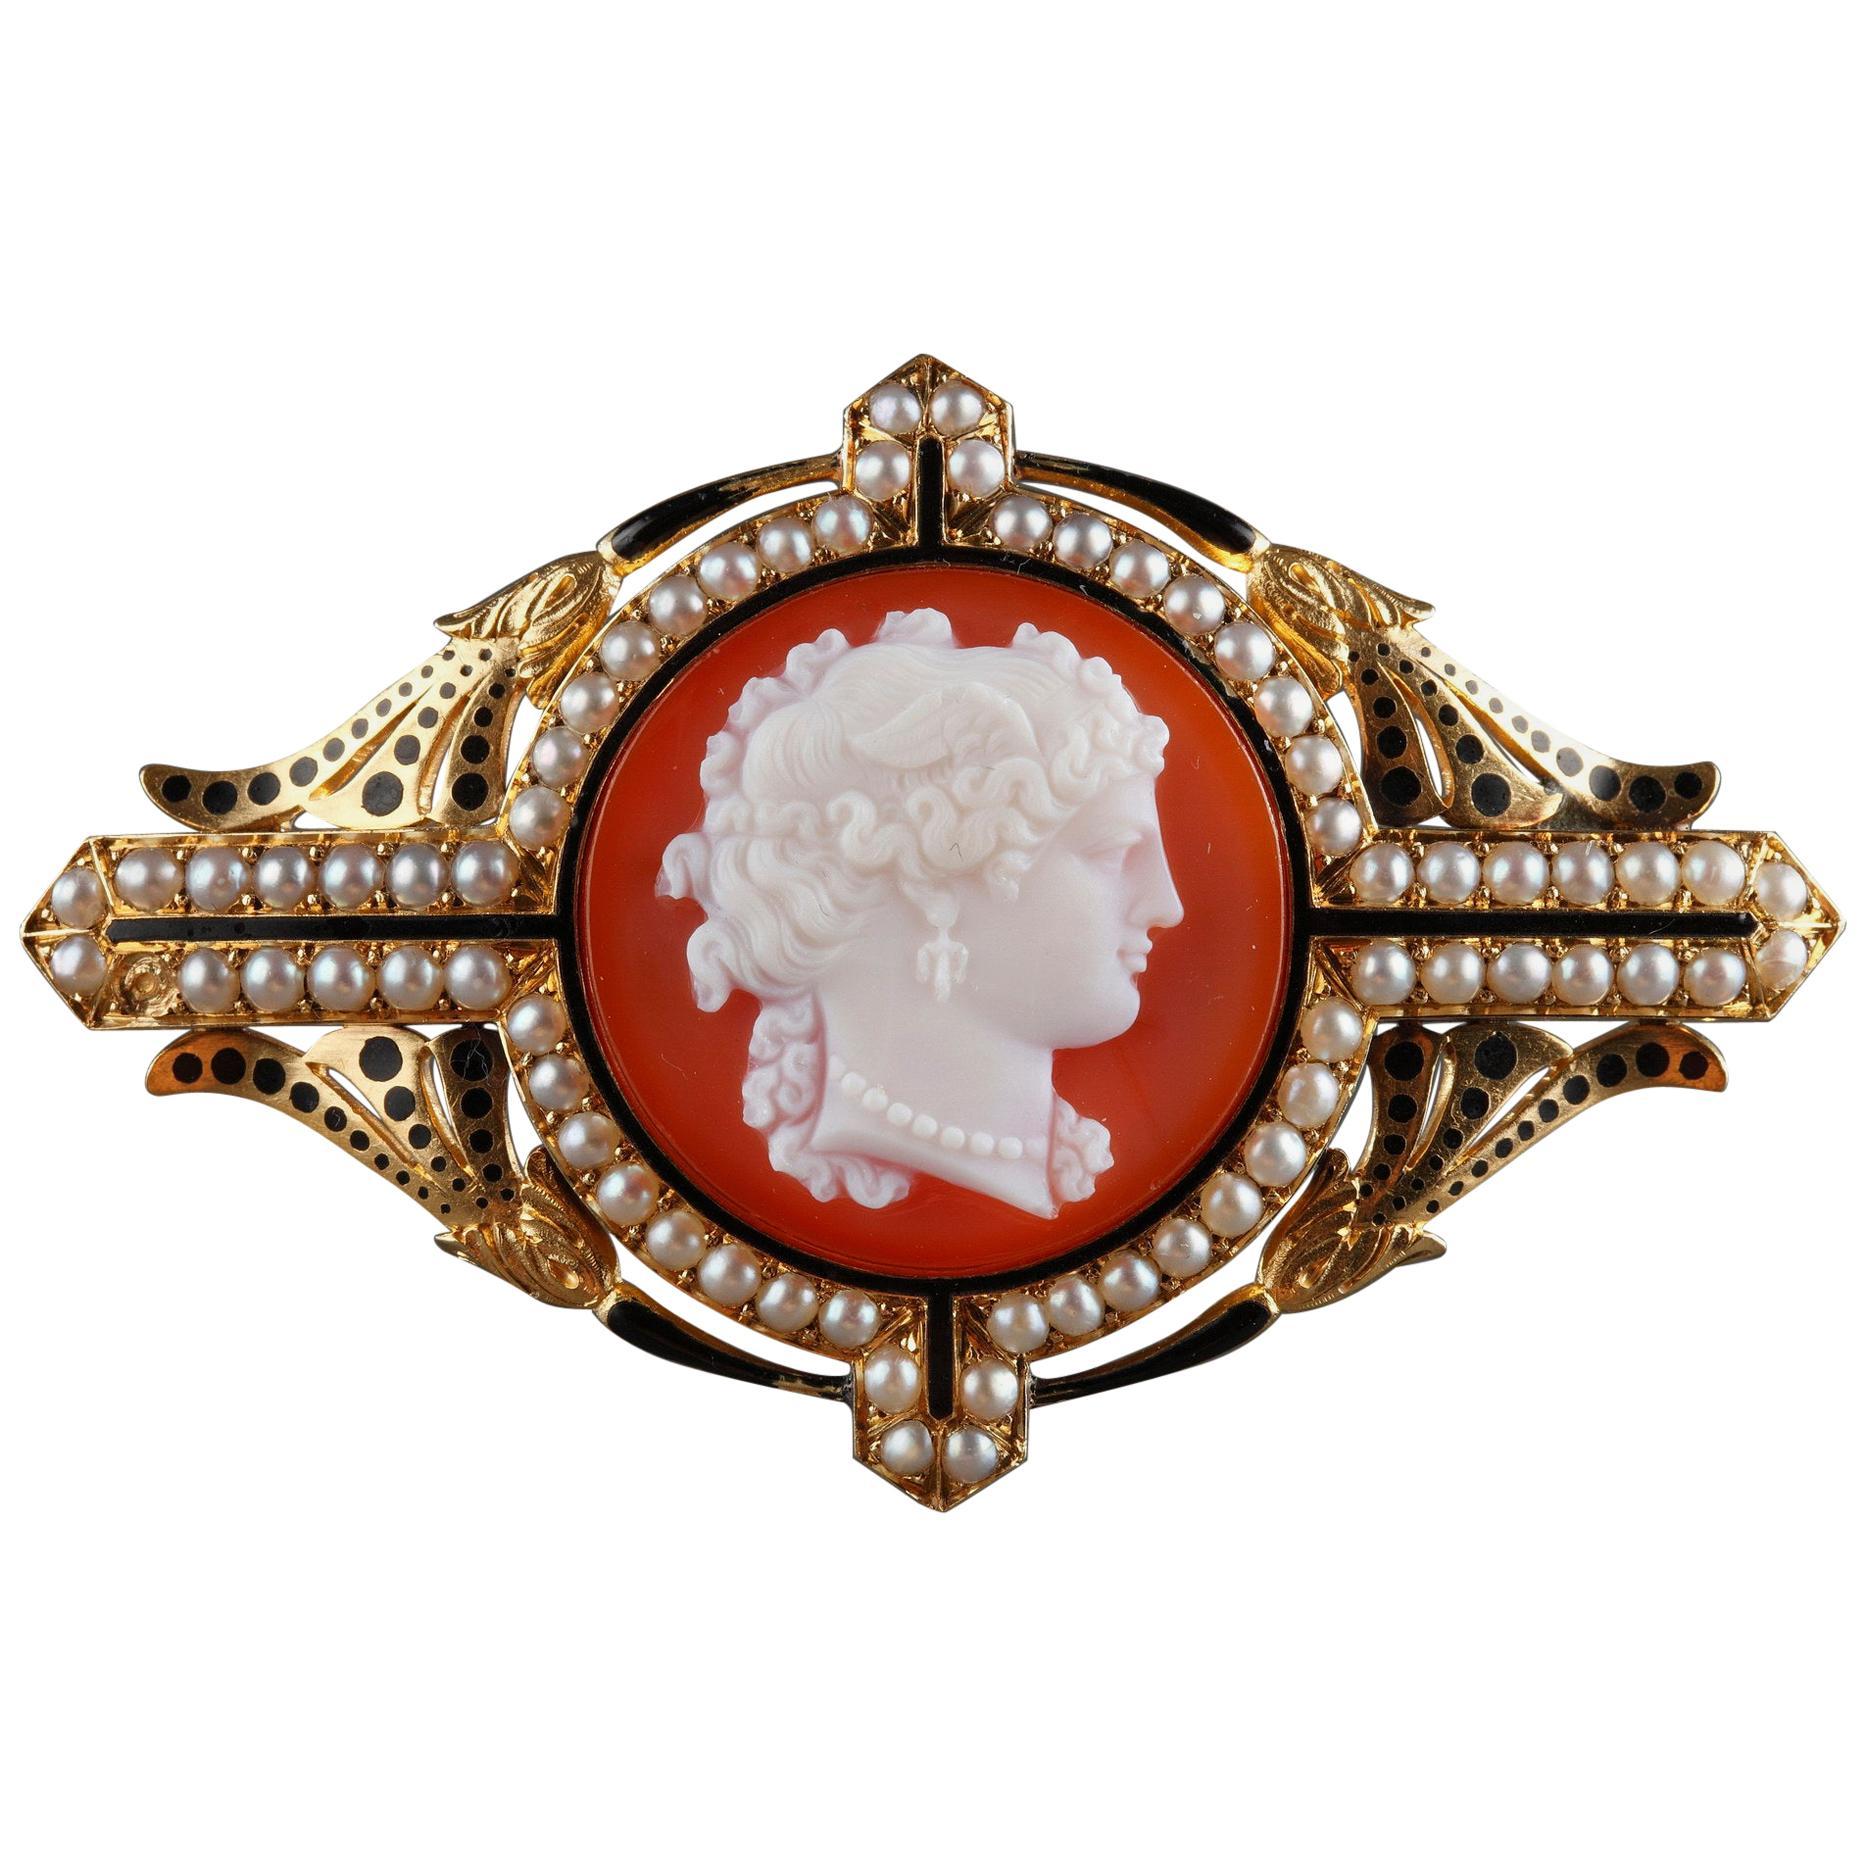 19th Century Gold Cameo Brooch